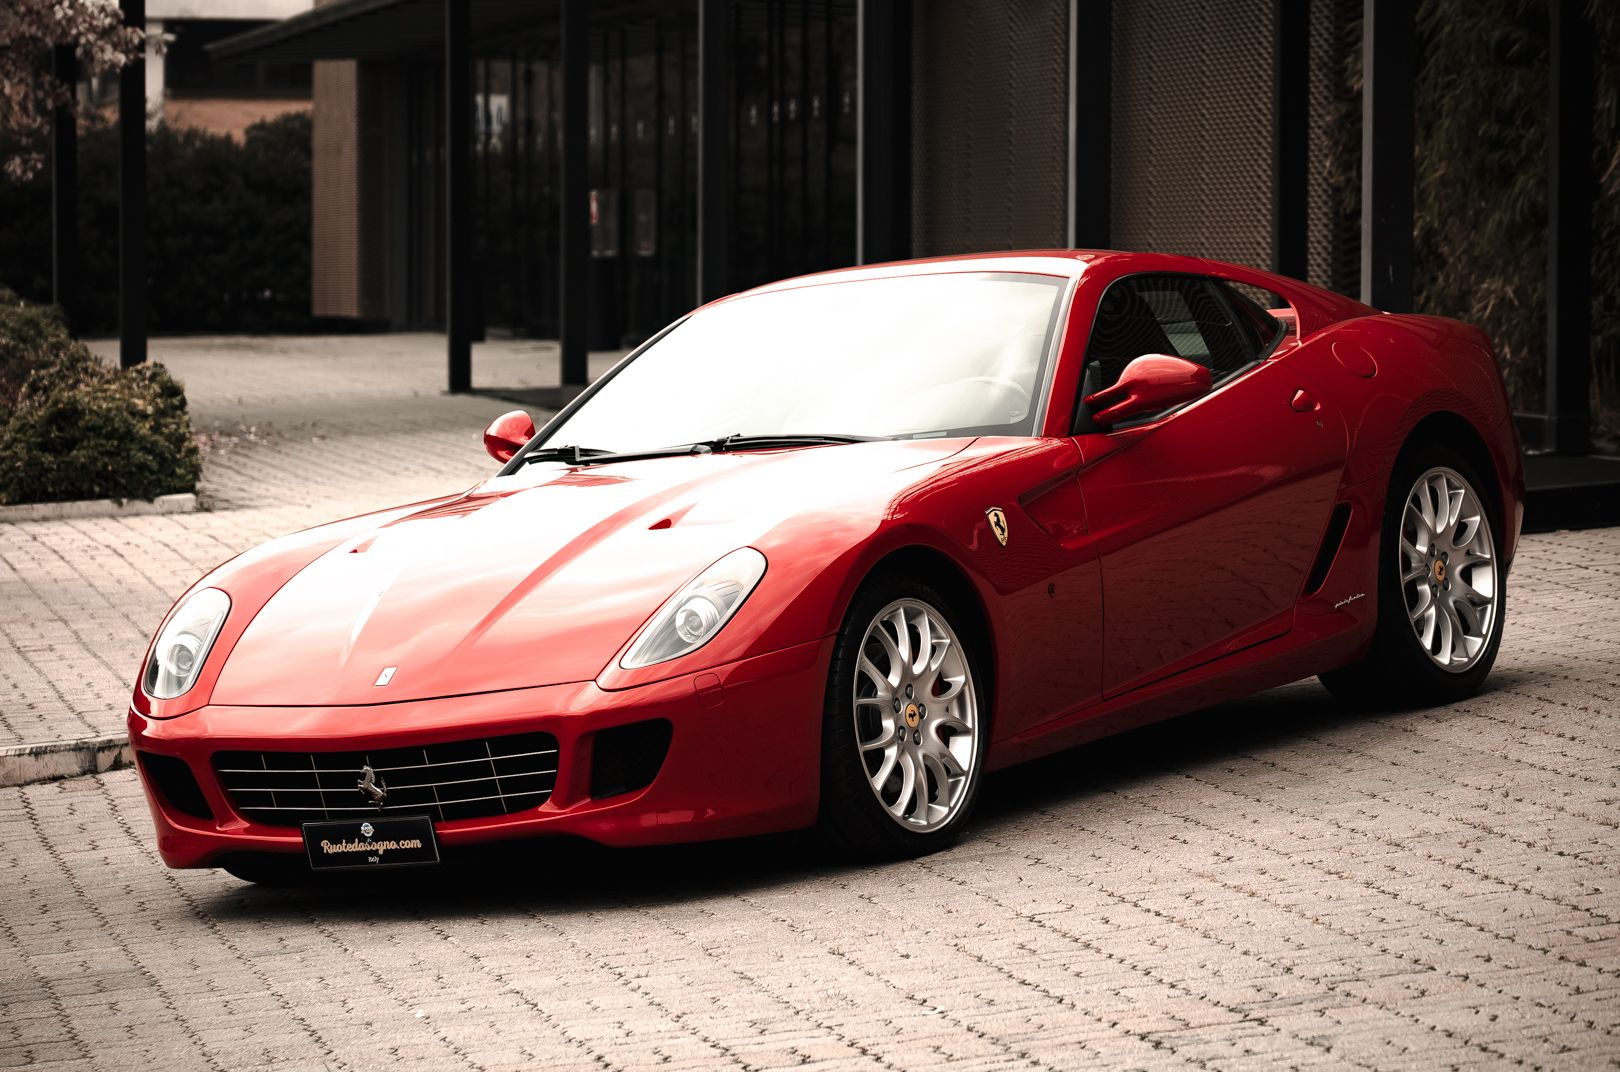 2007 Ferrari 599 GTB Fiorano 64962